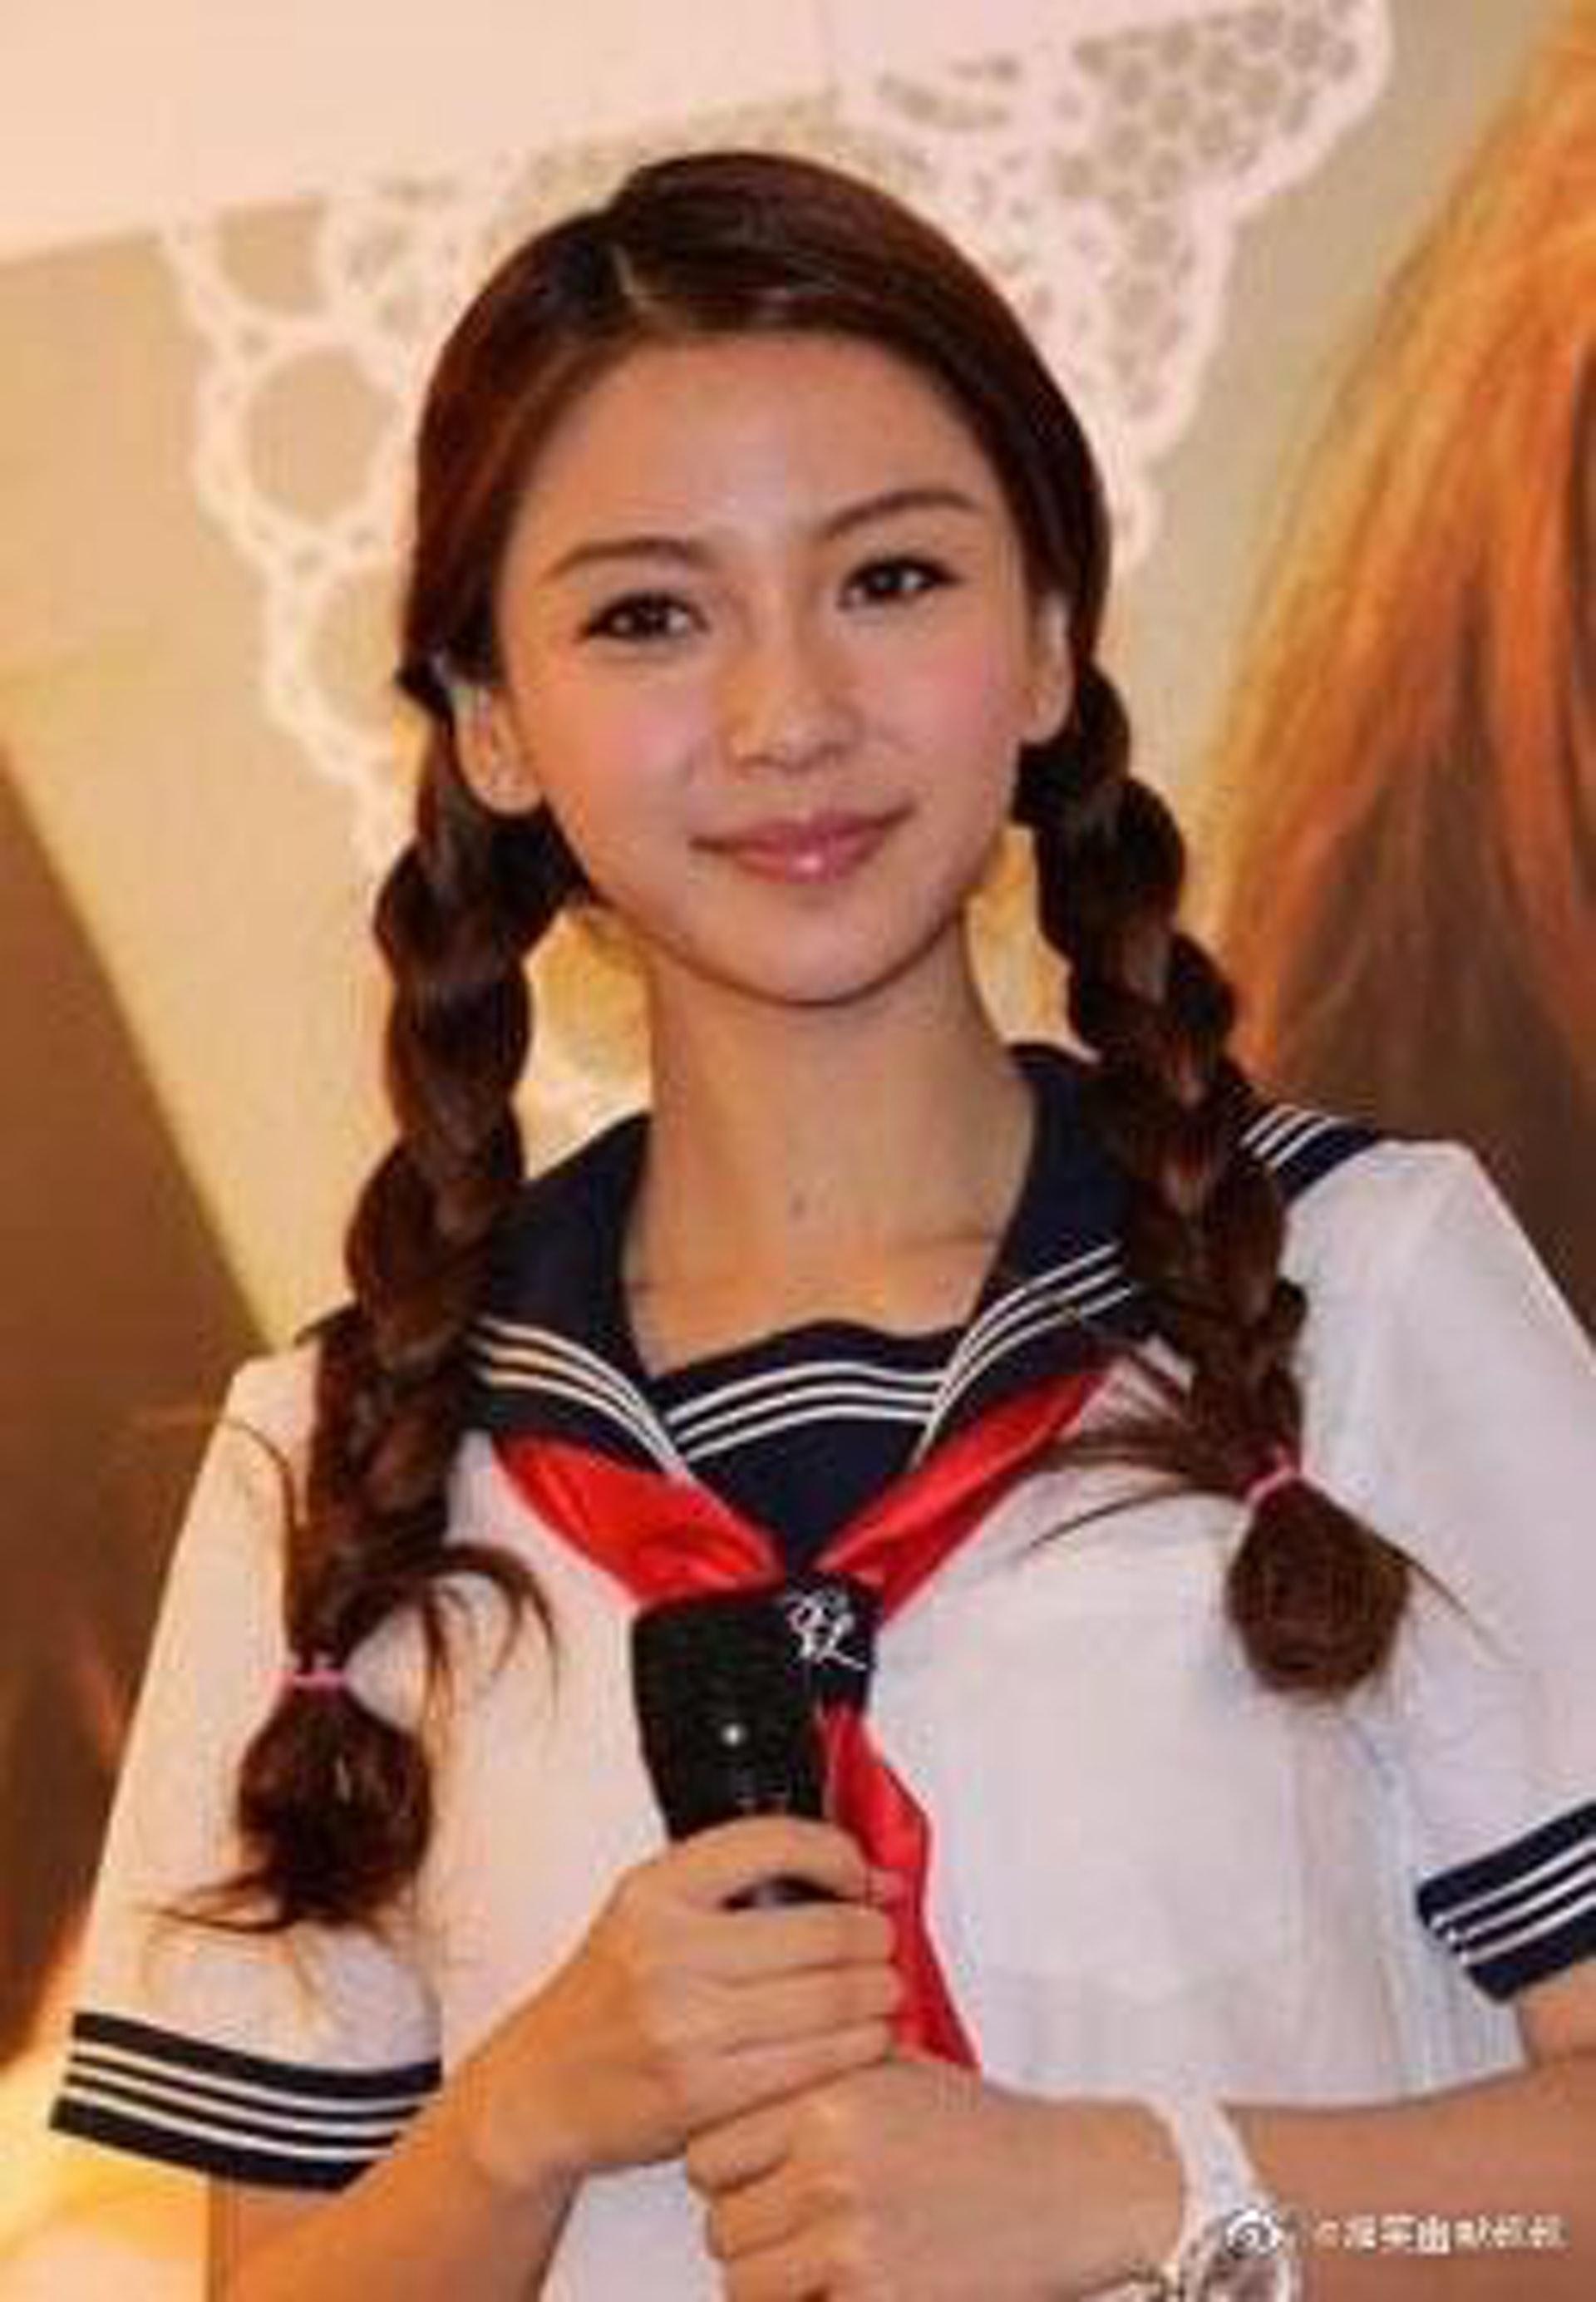 Angelababy出道初期的清純學生妹look很受歡迎。(微博:@搞笑幽默叔叔)